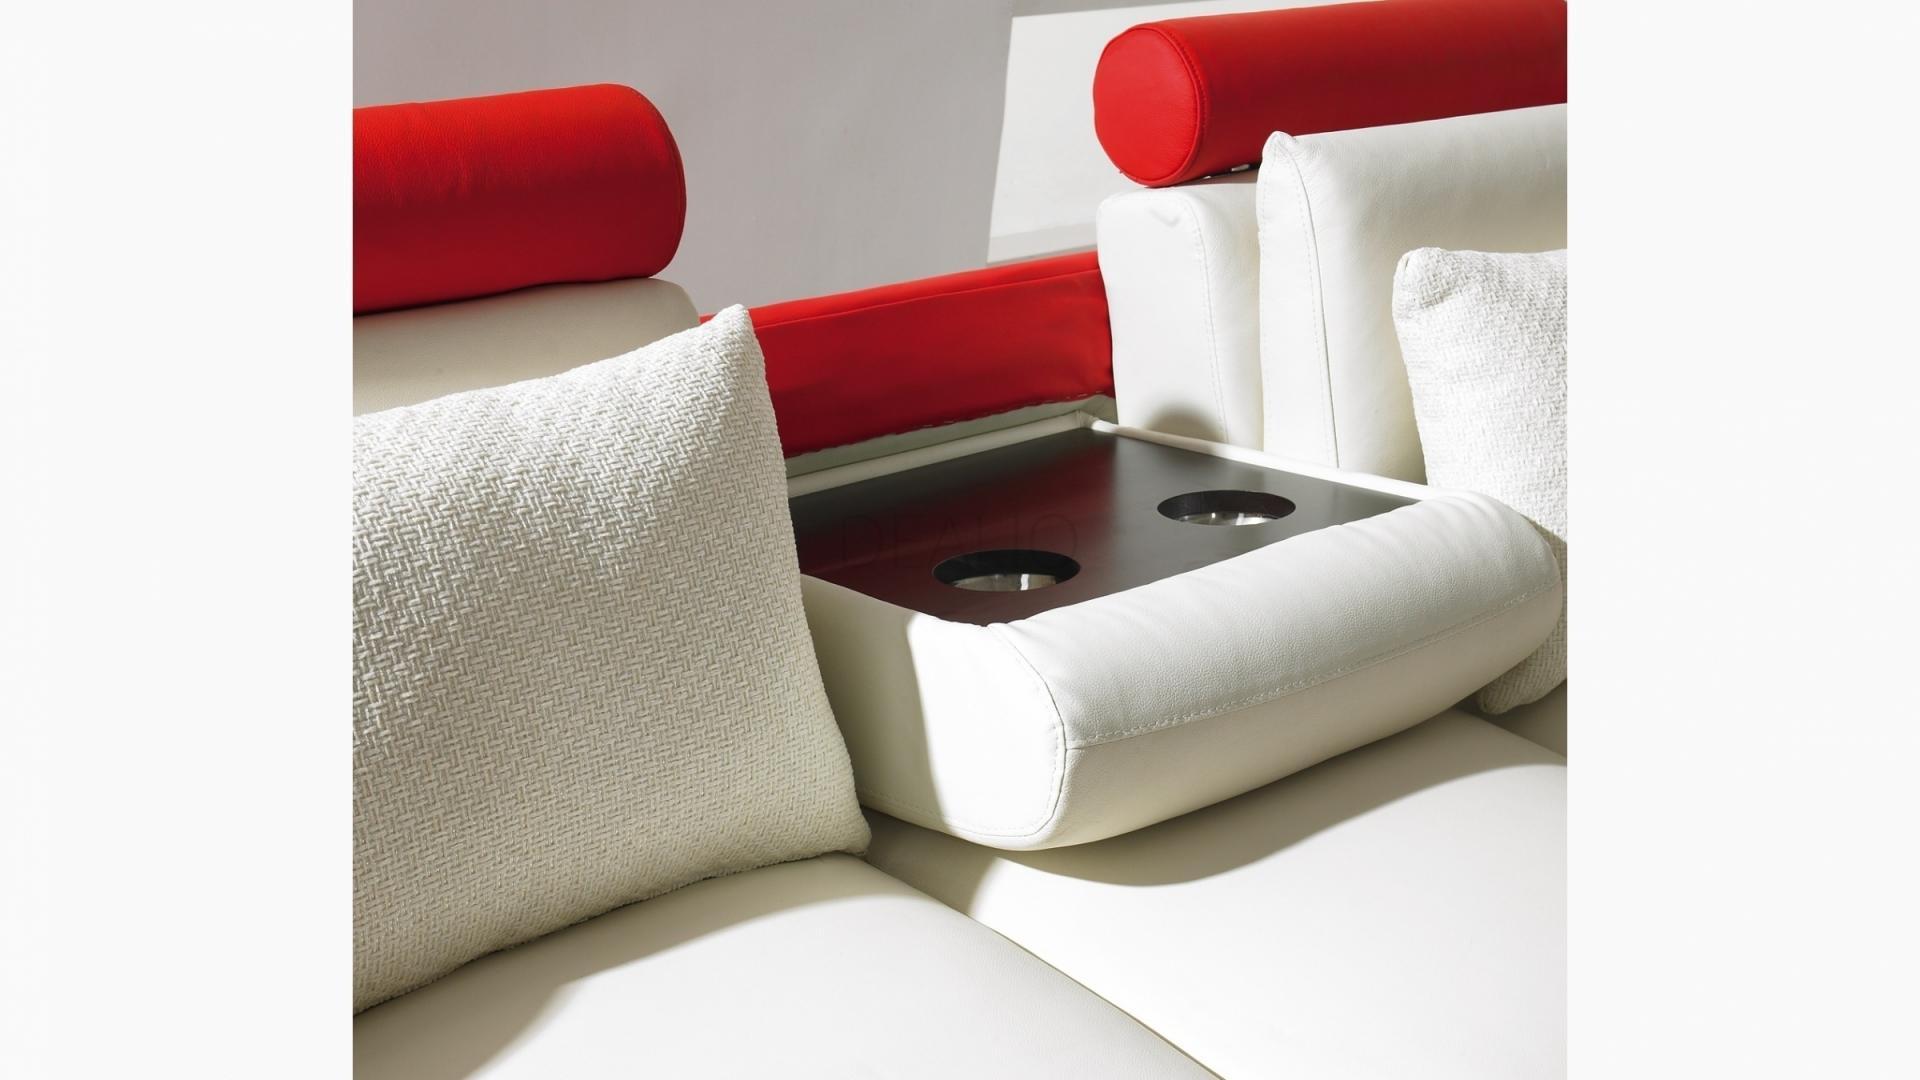 leather sofa set 3 1 black childs chair unwind suite 43 2 lounge life